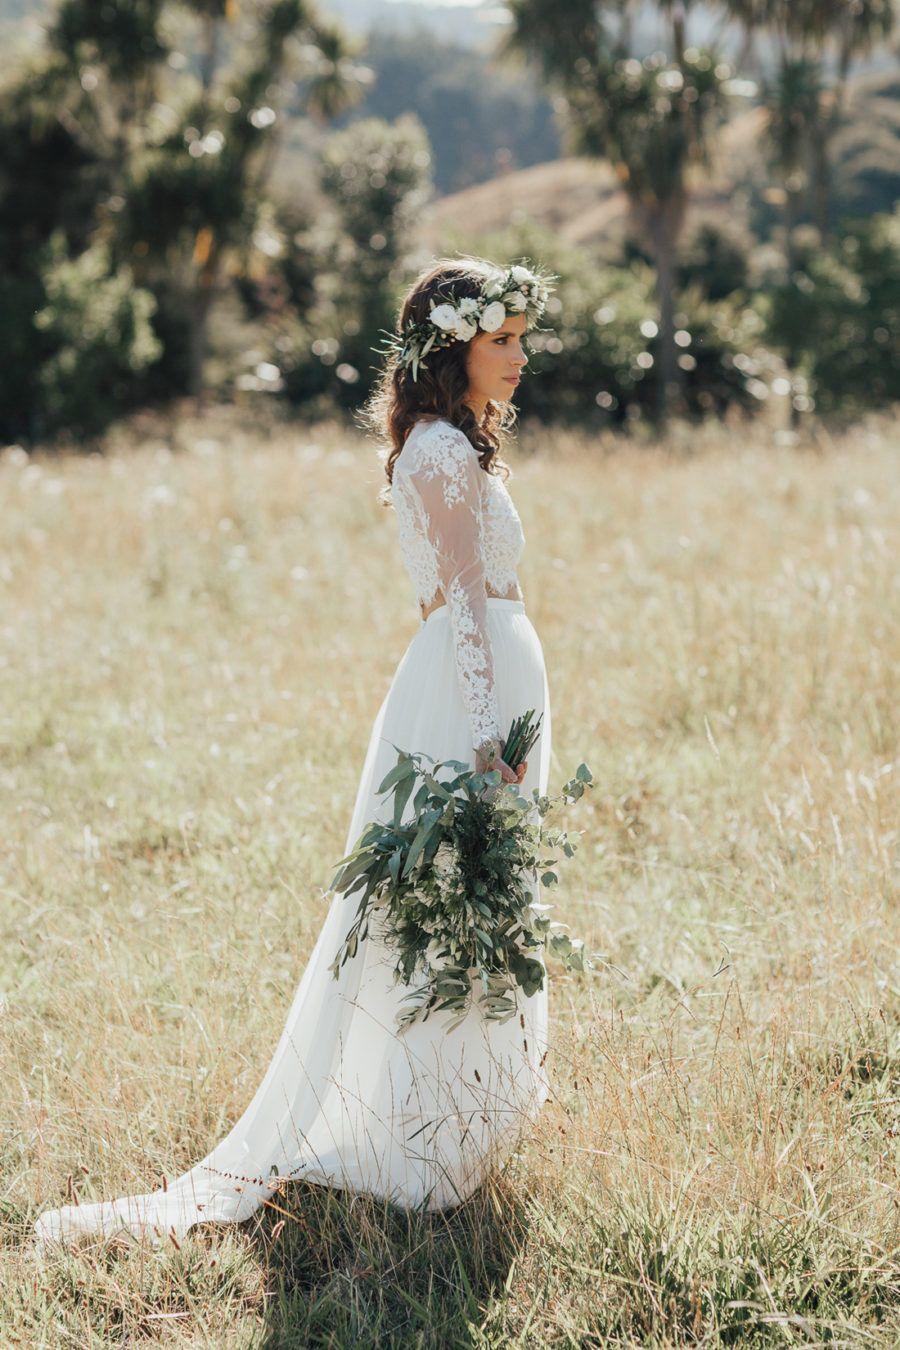 Boho bride la novia pinterest flower crowns crown and flower